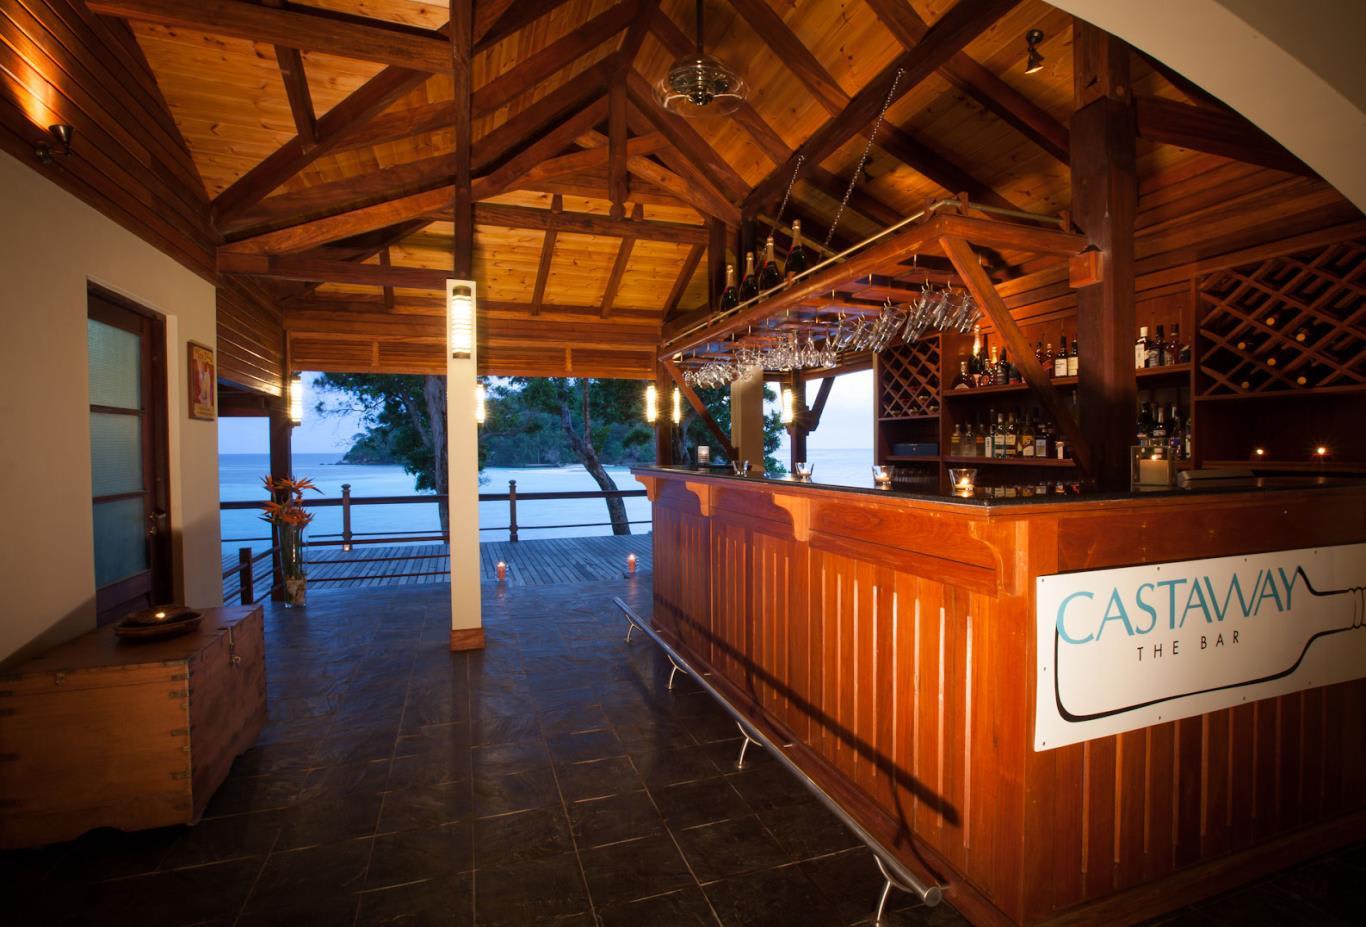 Castaway Bar